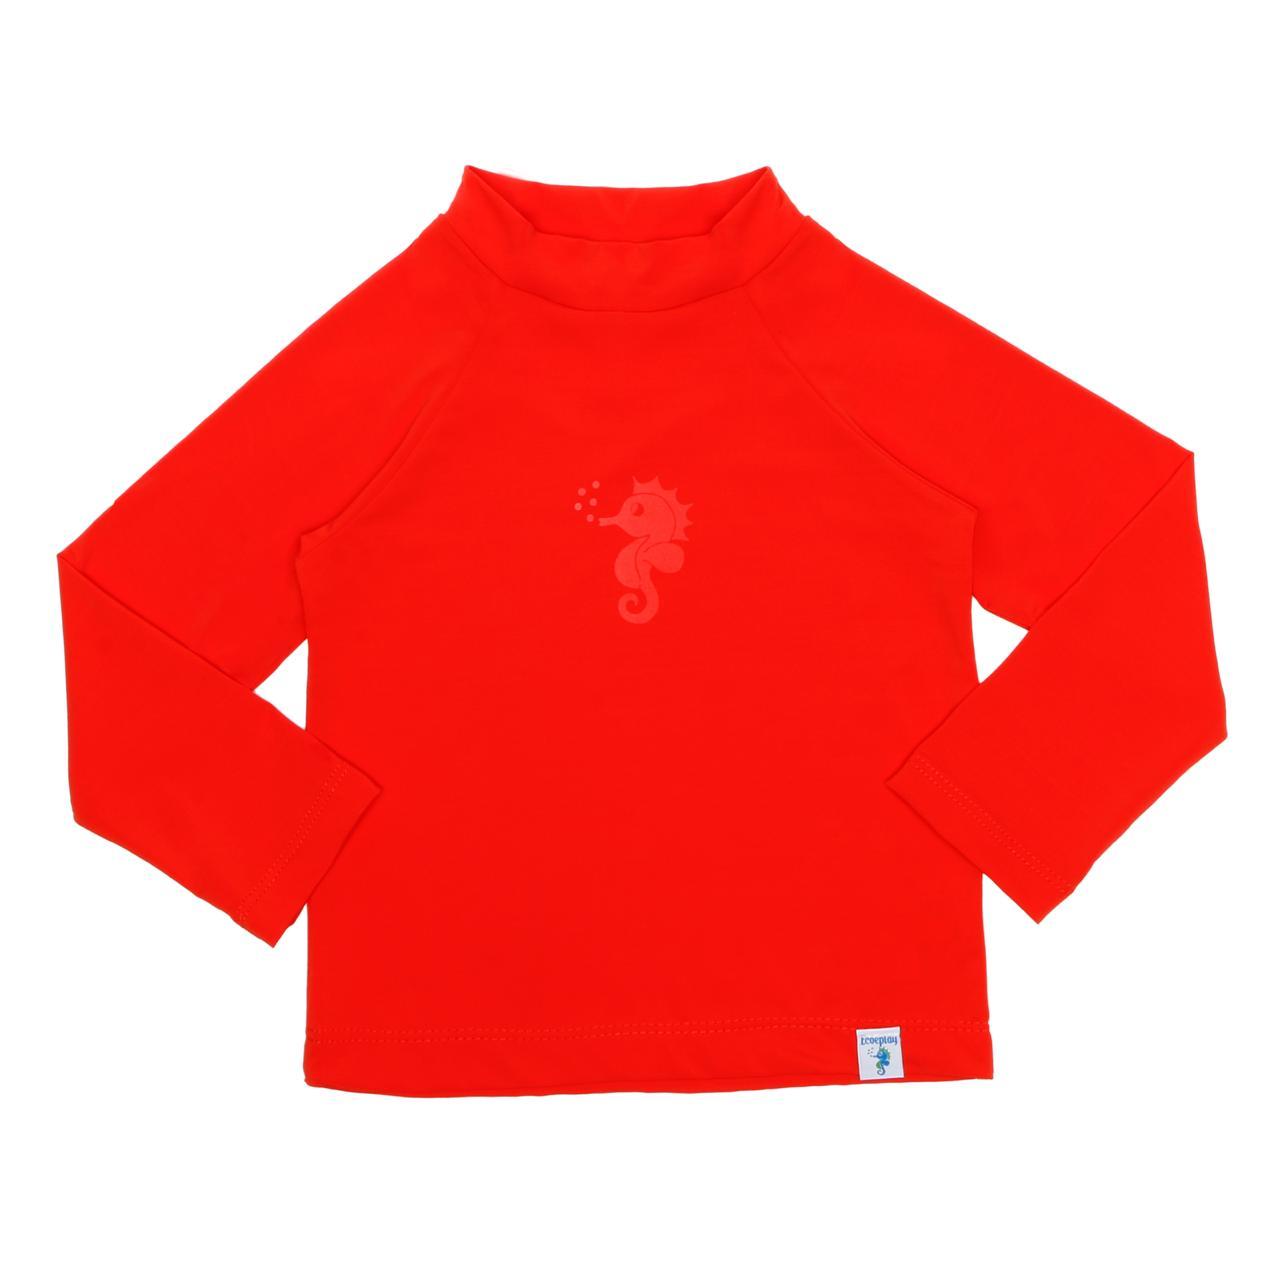 Camisa Manga Longa Banho Piscina e Mar FPU50 Vermelha - Ecoeplay